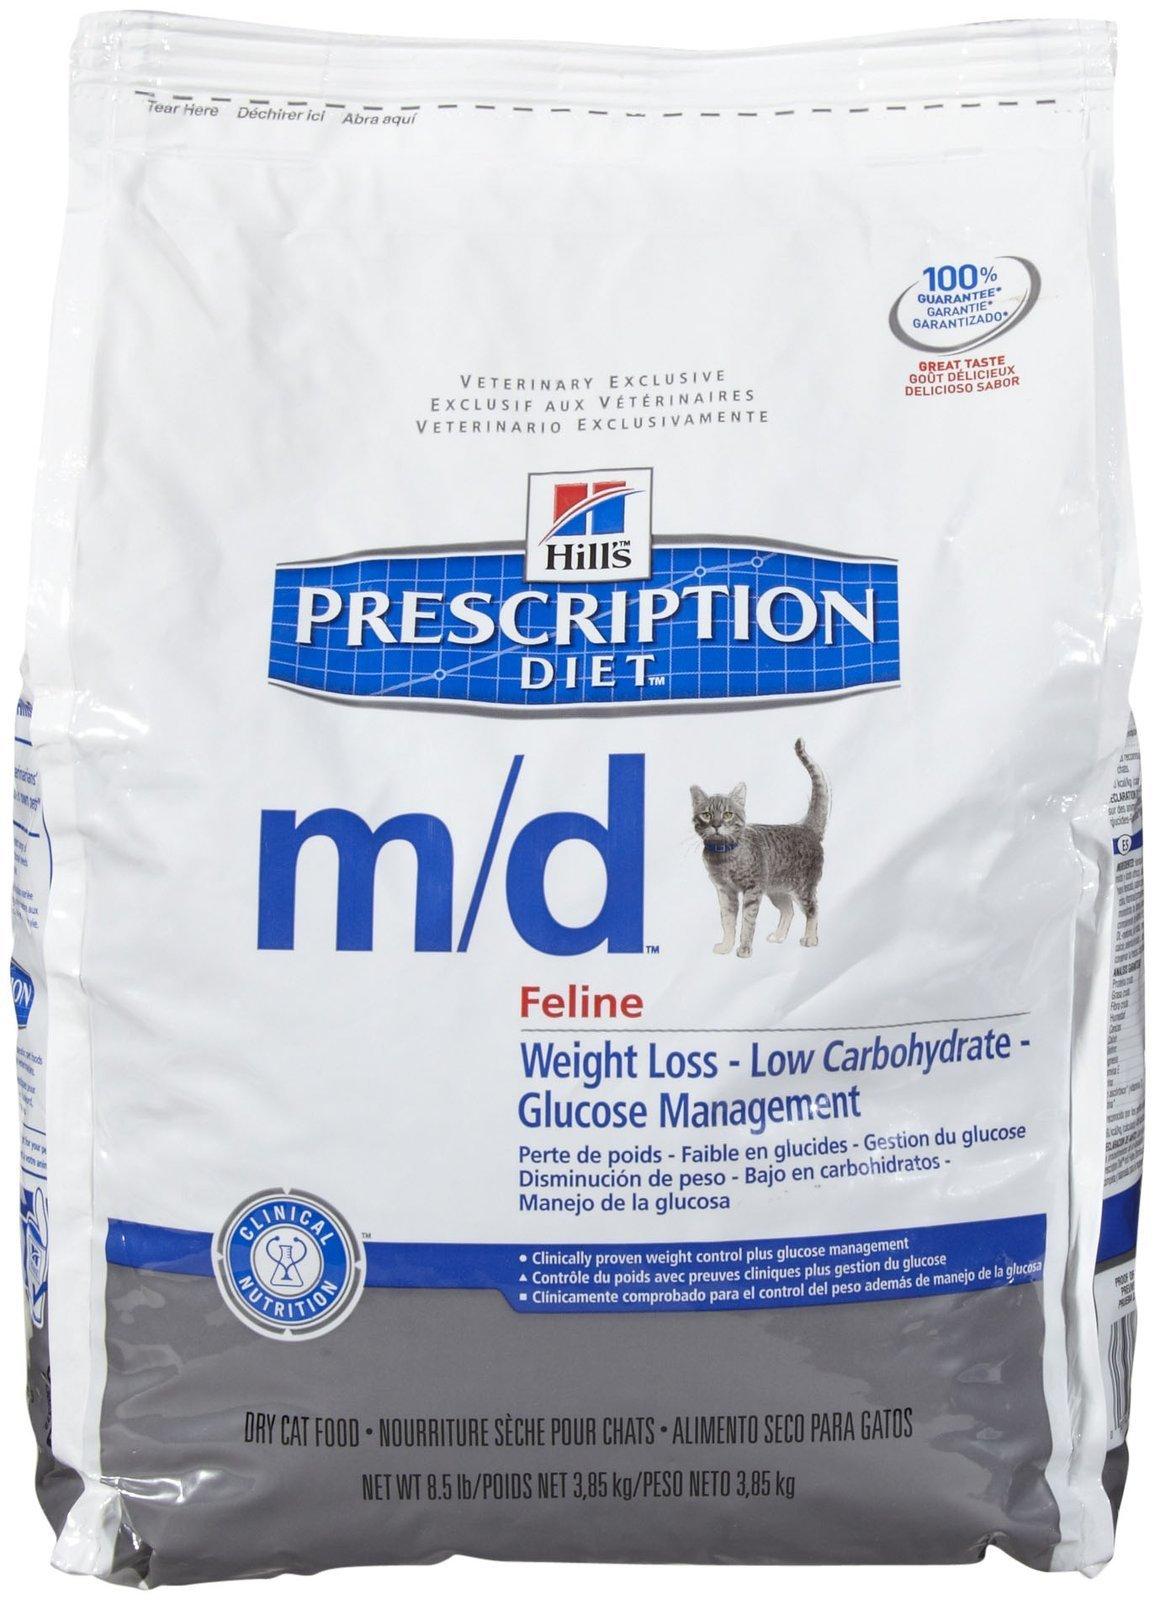 Hill'S Prescription Diet M/D Feline Glucose/Weight Management - Chicken Flavor - 8.5Lb by HILL'S PRESCRIPTION DIET